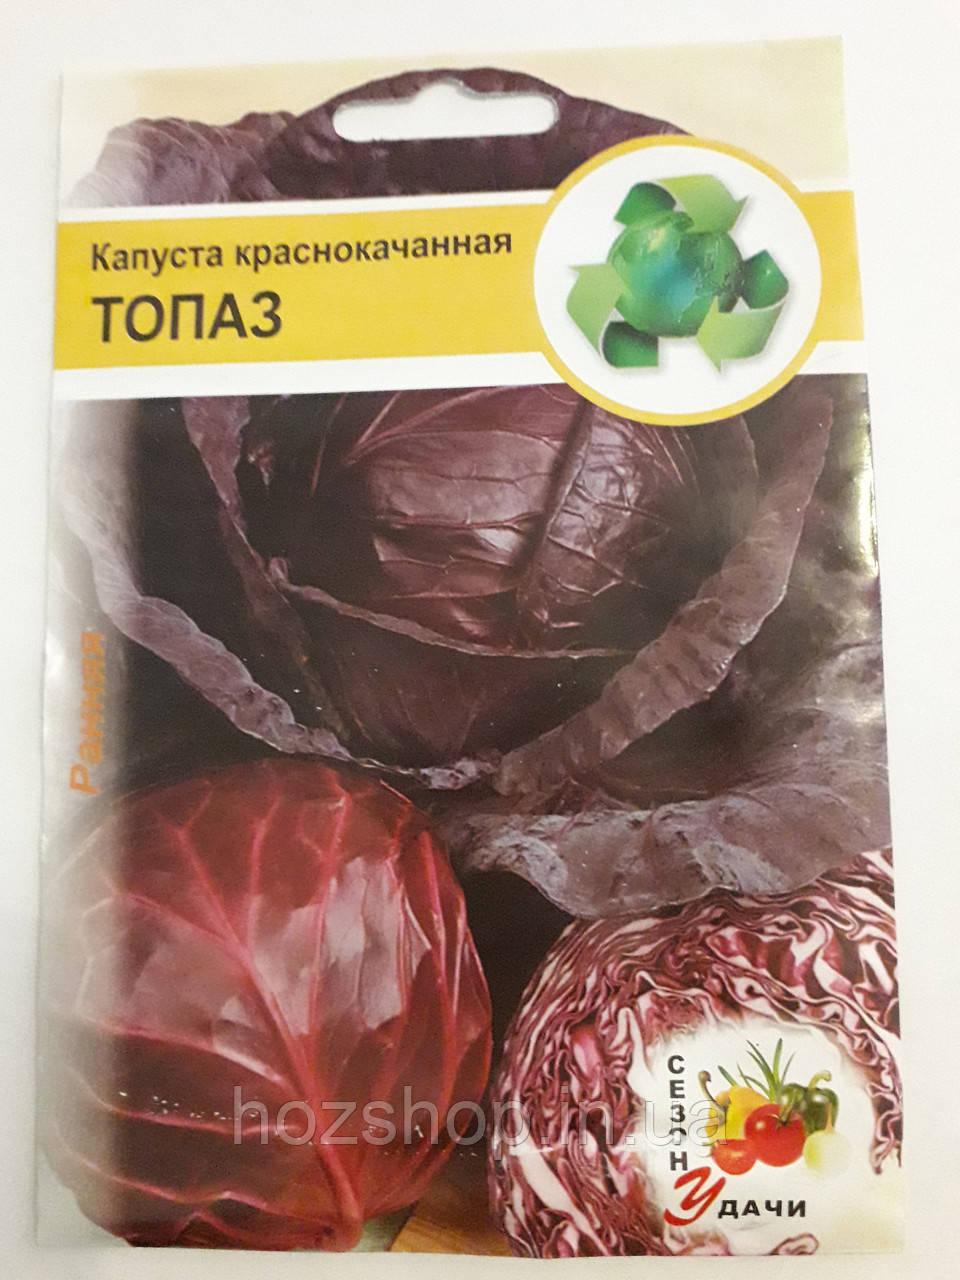 Капуста краснокочанная Топаз ранняя 3 г (минимальный заказ 10 пачек)